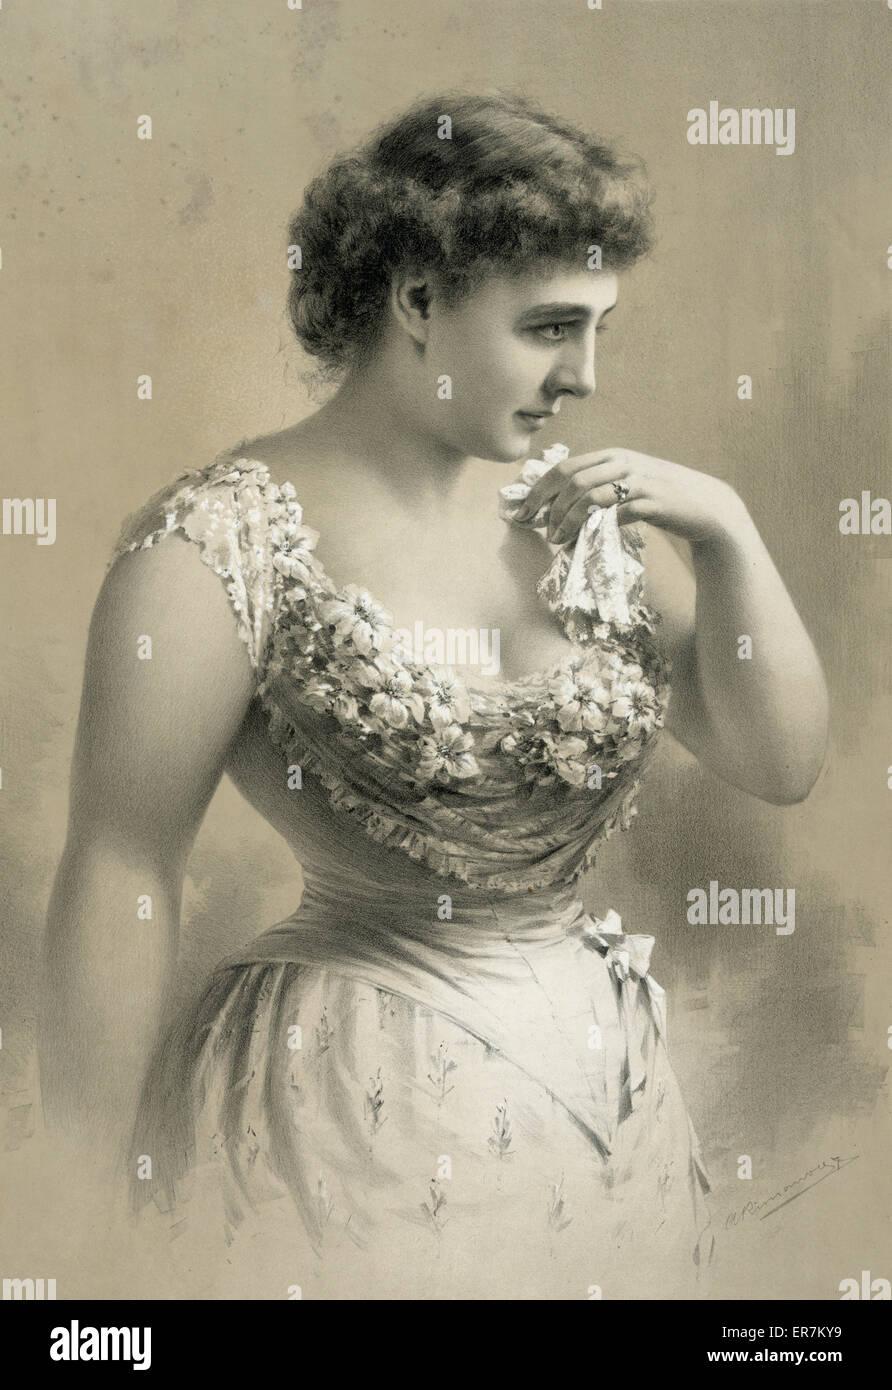 Unidentified woman. Date c1891 Apr. 20. - Stock Image